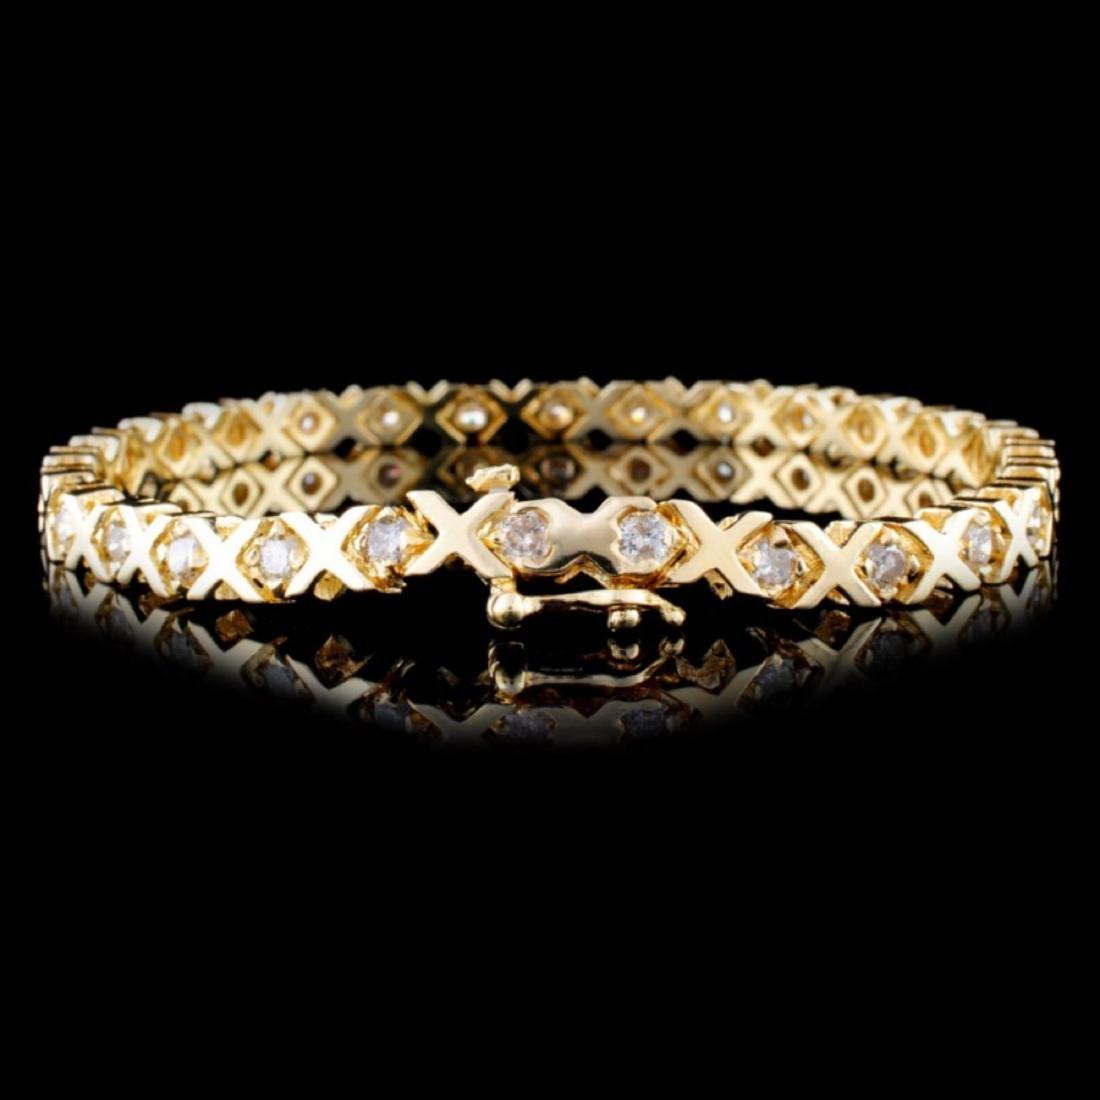 14K Yellow Gold 3.00ctw Diamond Bracelet - 2